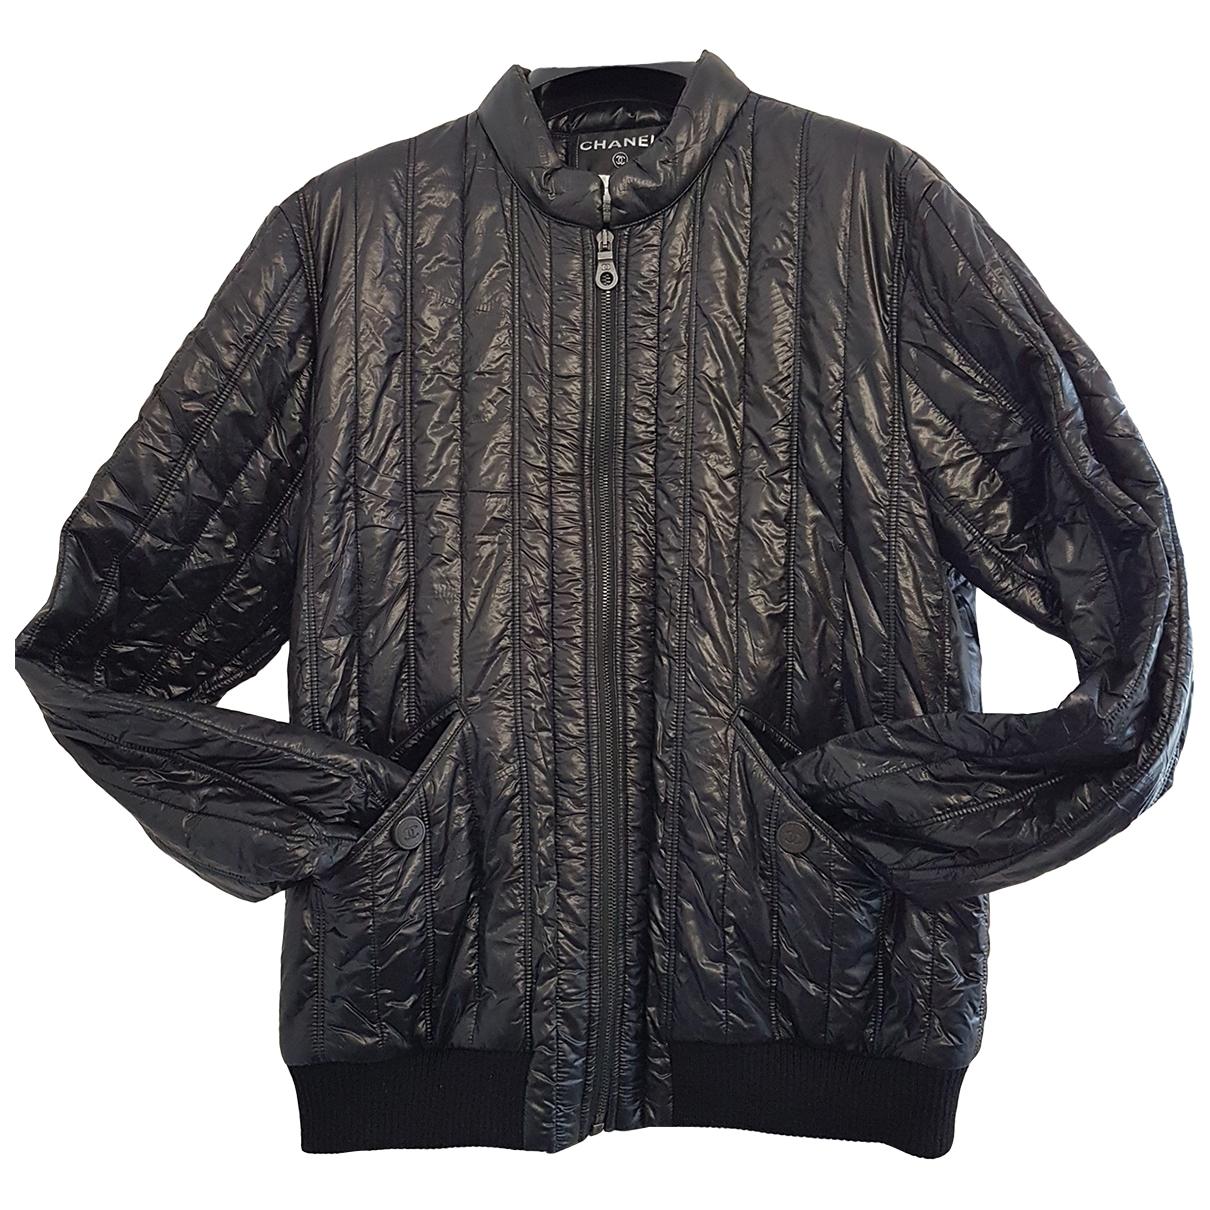 Chanel \N Lederjacke in  Schwarz Polyester